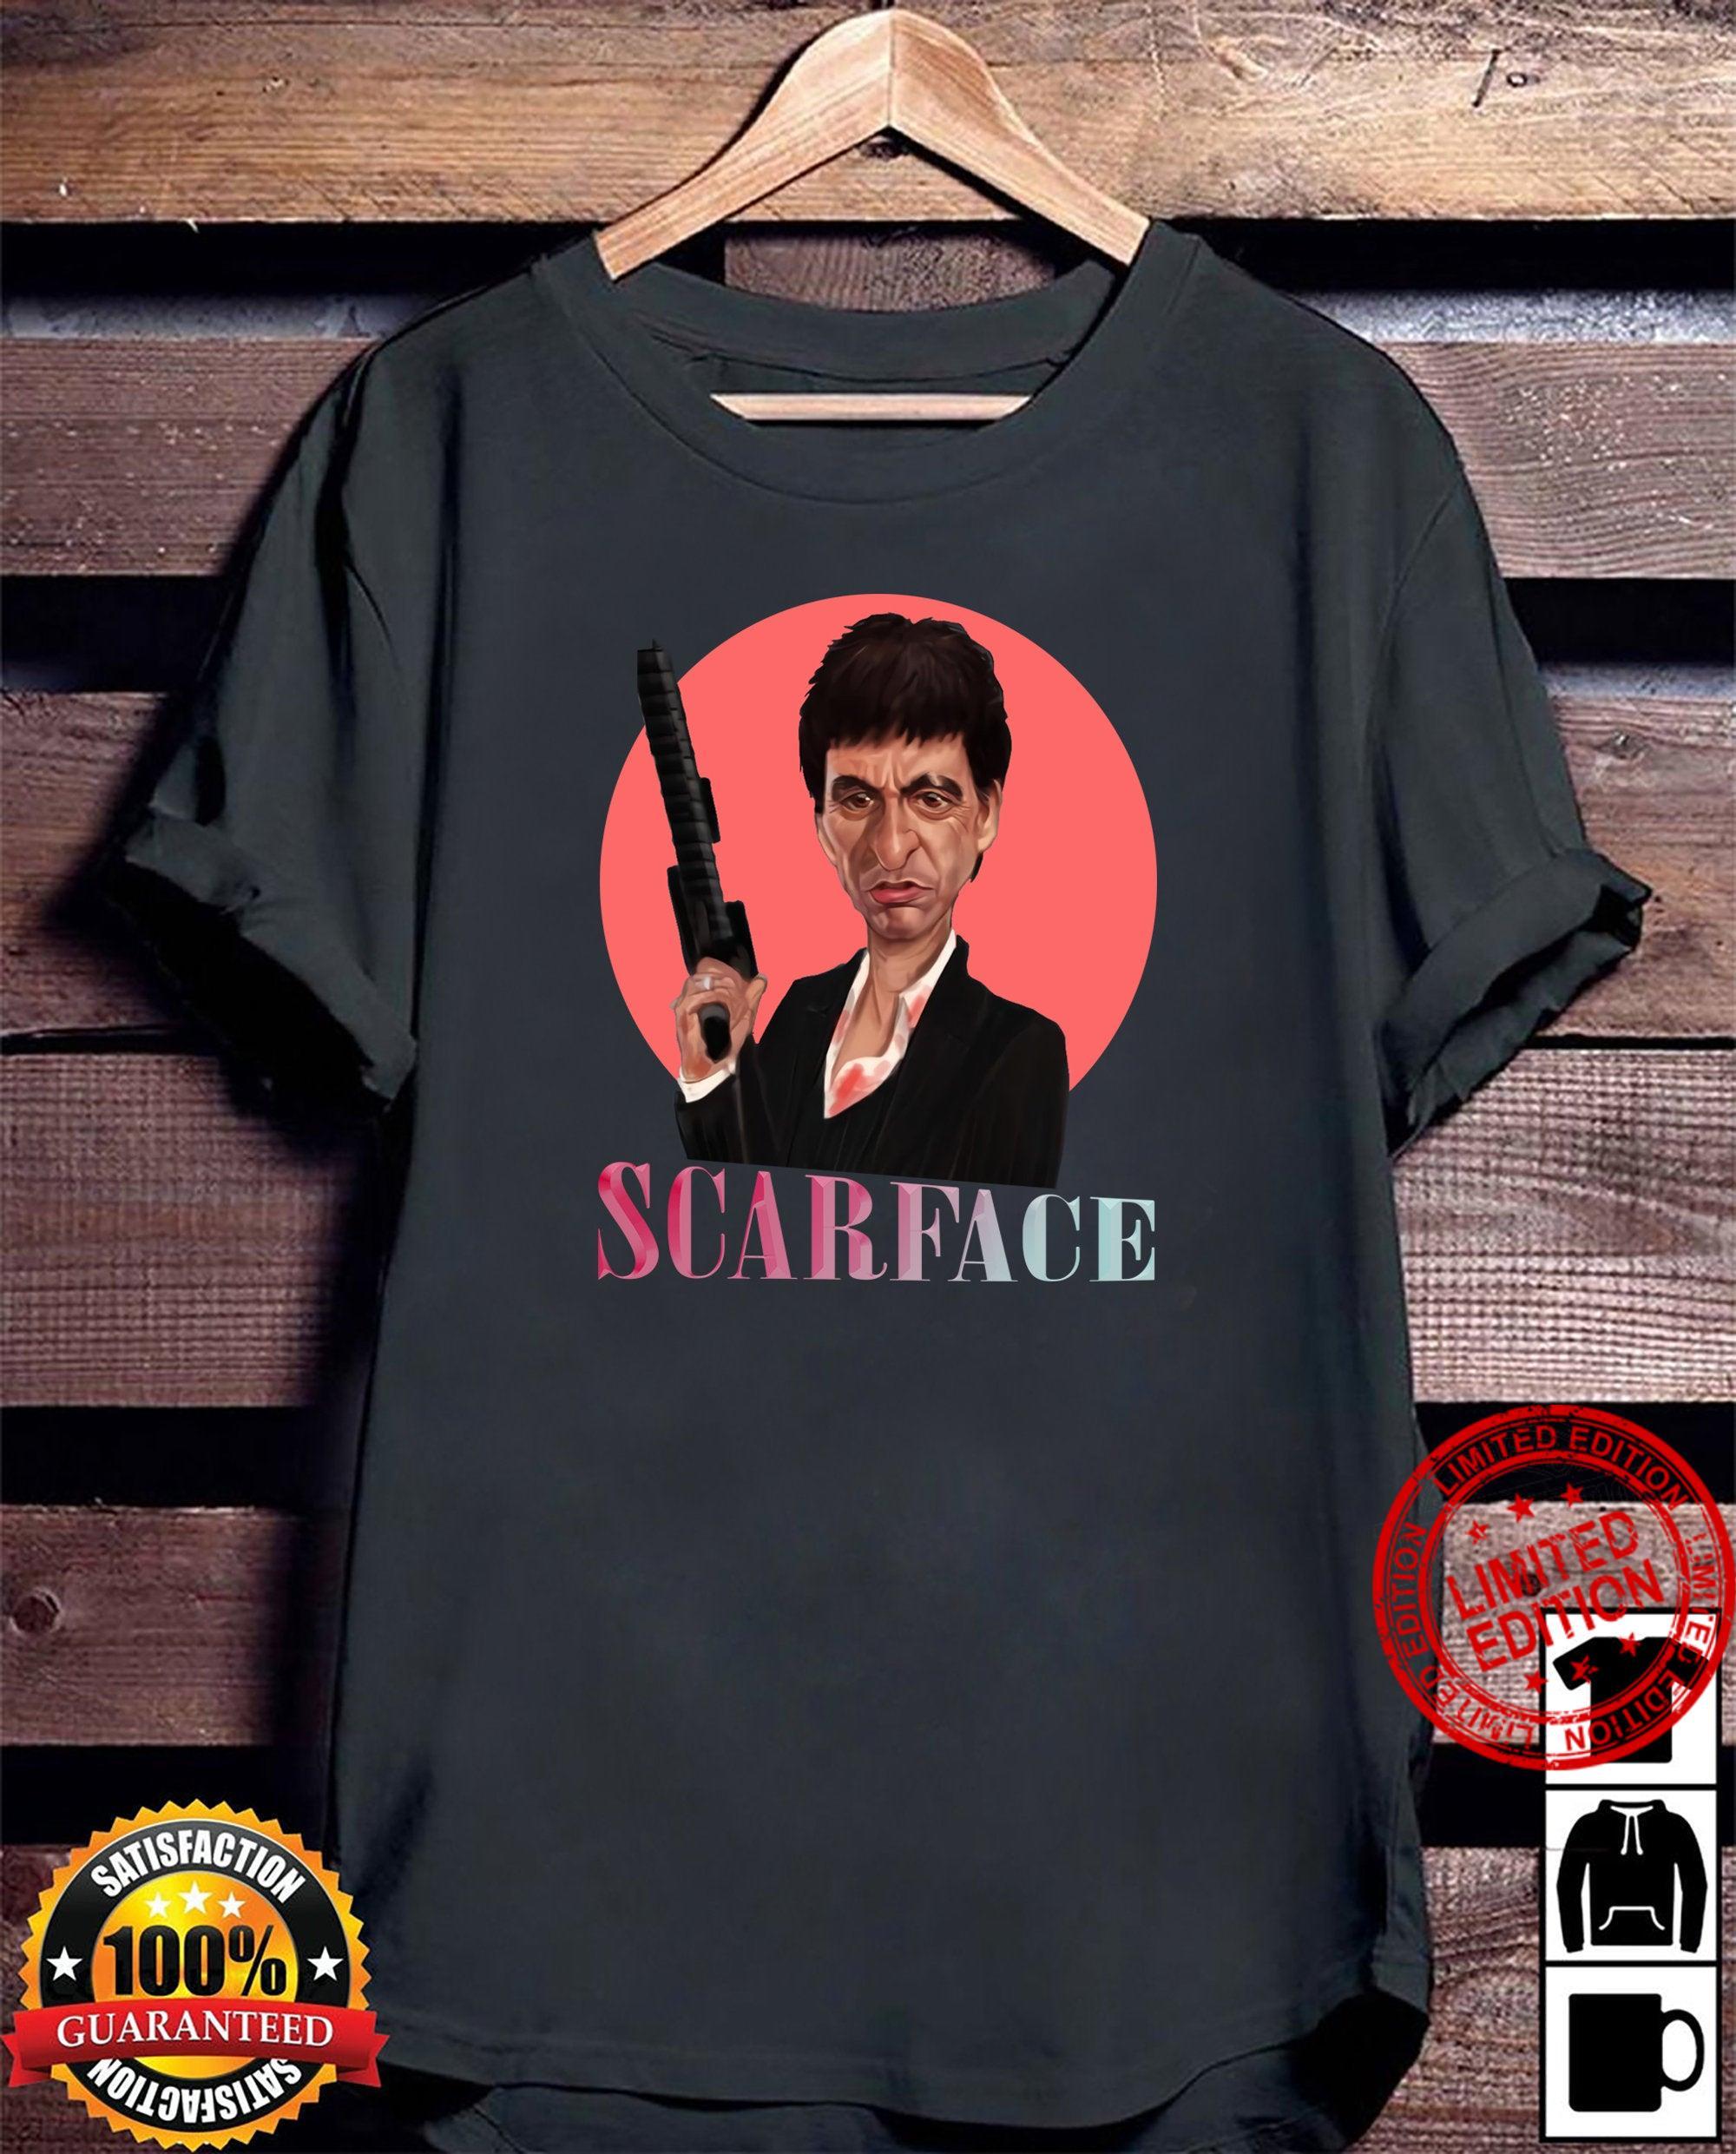 Scarface 80S Movies Scarface Movie Tee Funny Birthday Shirt